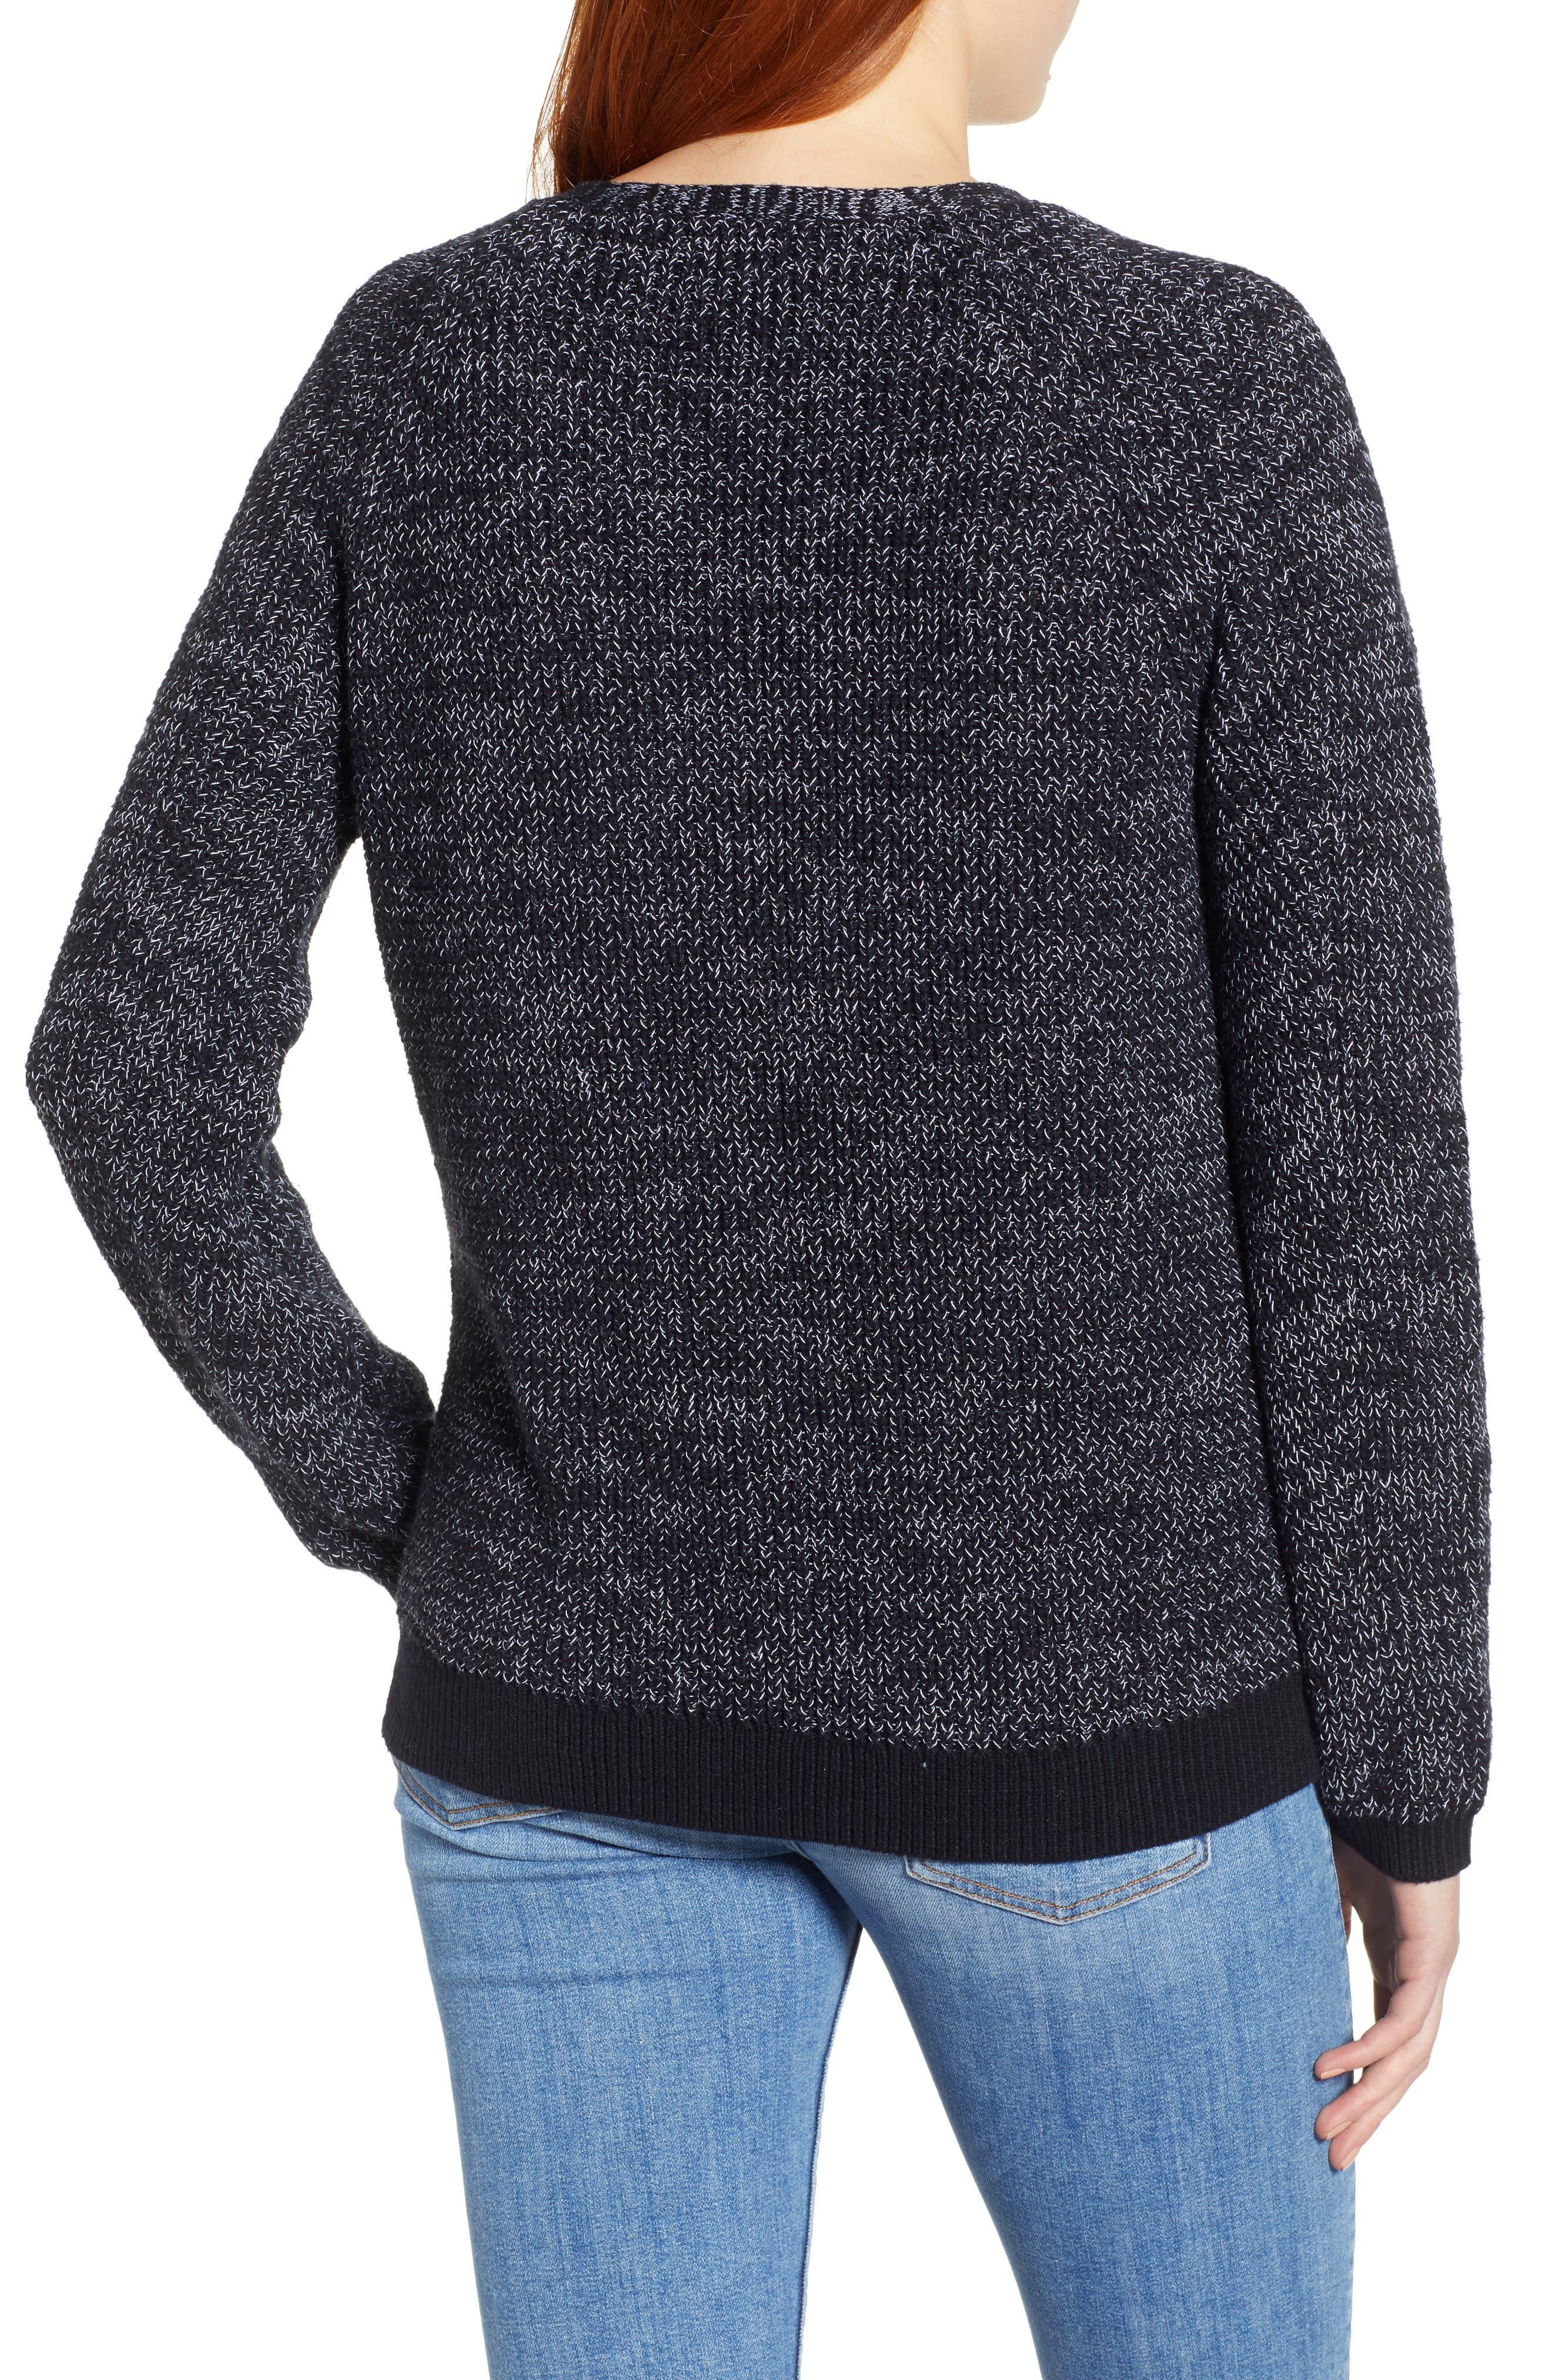 Raglan Sleeve Sweater,                             Alternate thumbnail 2, color,                             BLACK CREW MARL